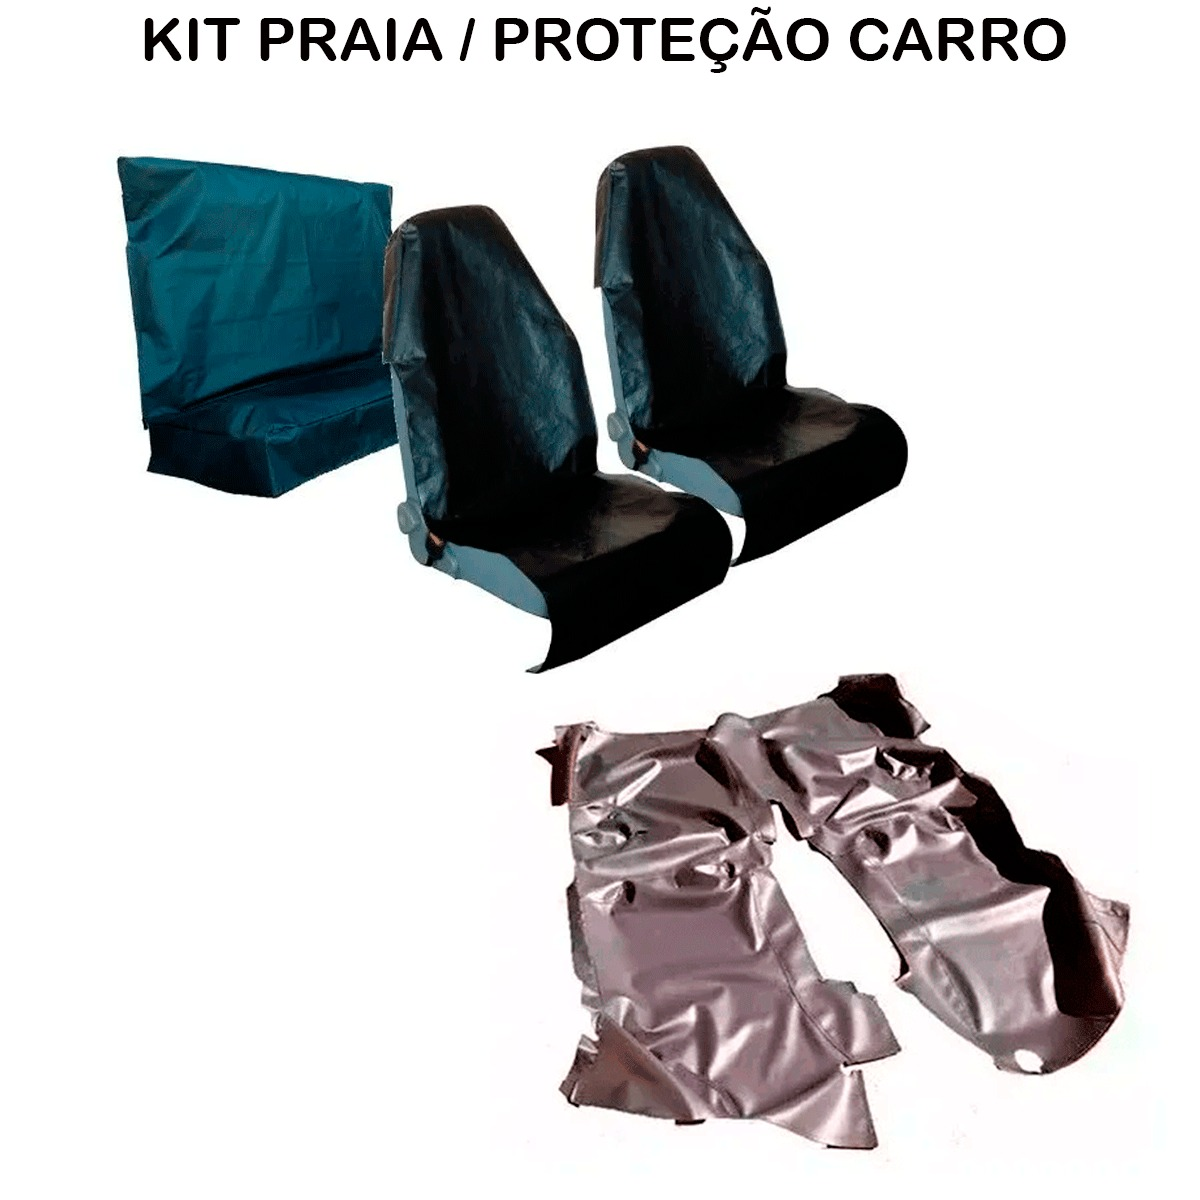 Tapete Em Vinil Fiat Cronos + Capa Banco Protecao Banco Areia Suor Academia